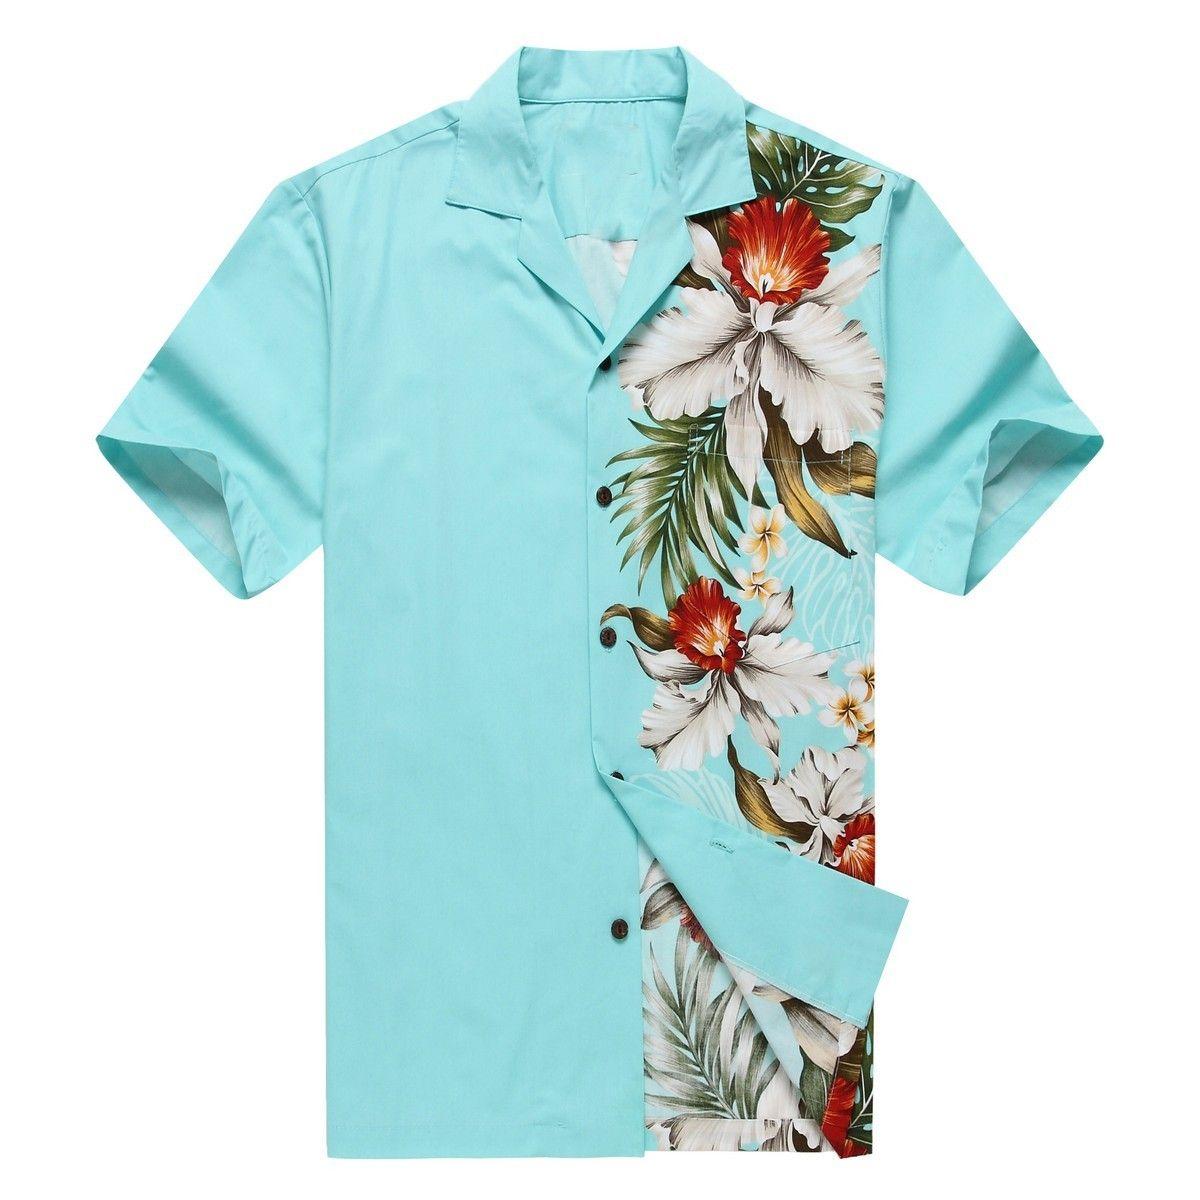 M/&S/&W Mens Military Short Sleeve Work Shirts Button Down Shirts